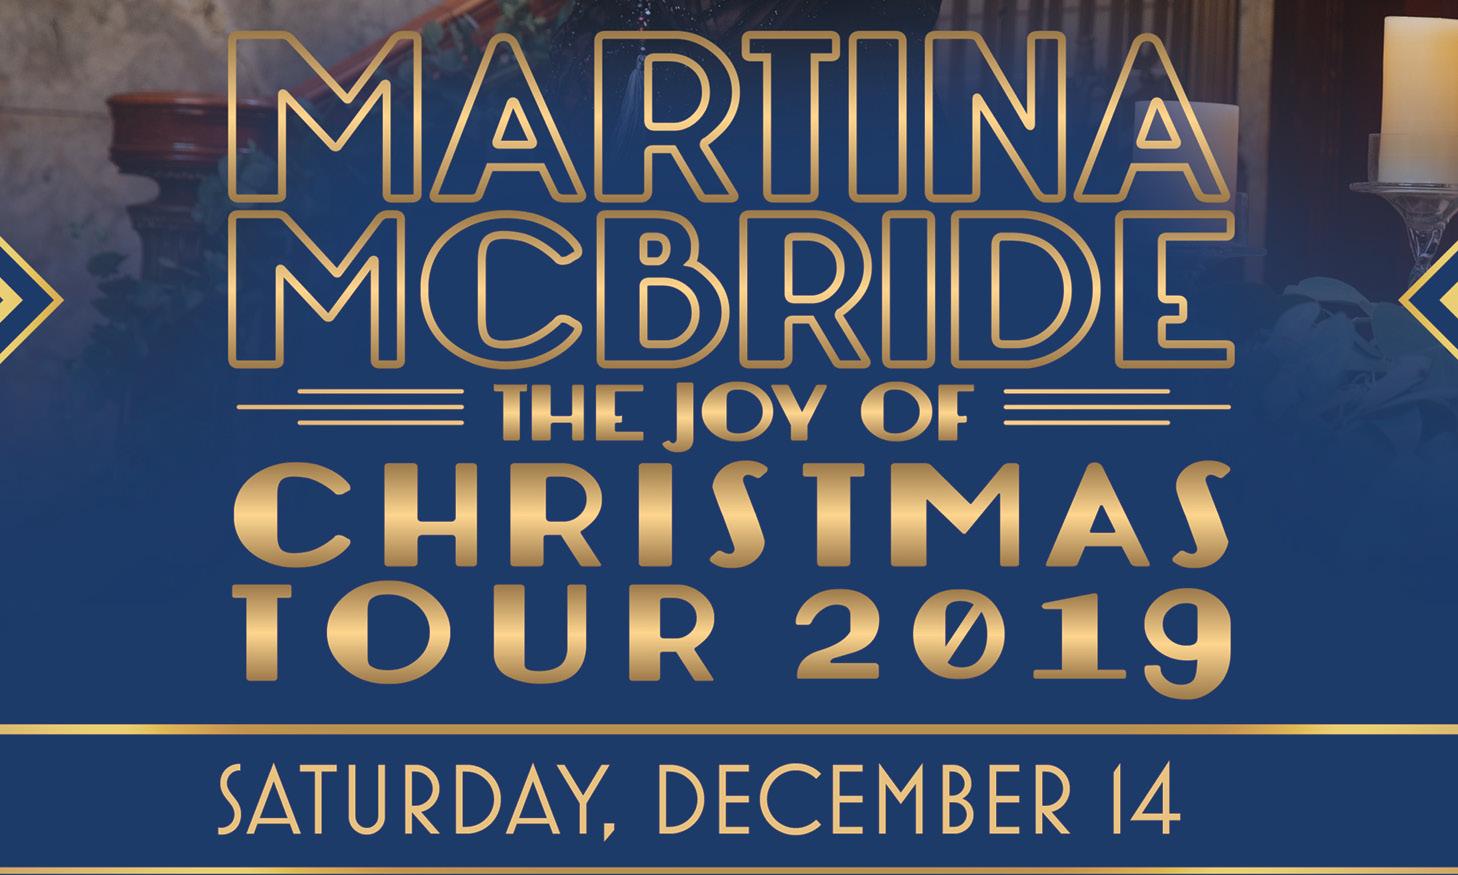 Image for Martina McBride: The Joy of Christmas 2019